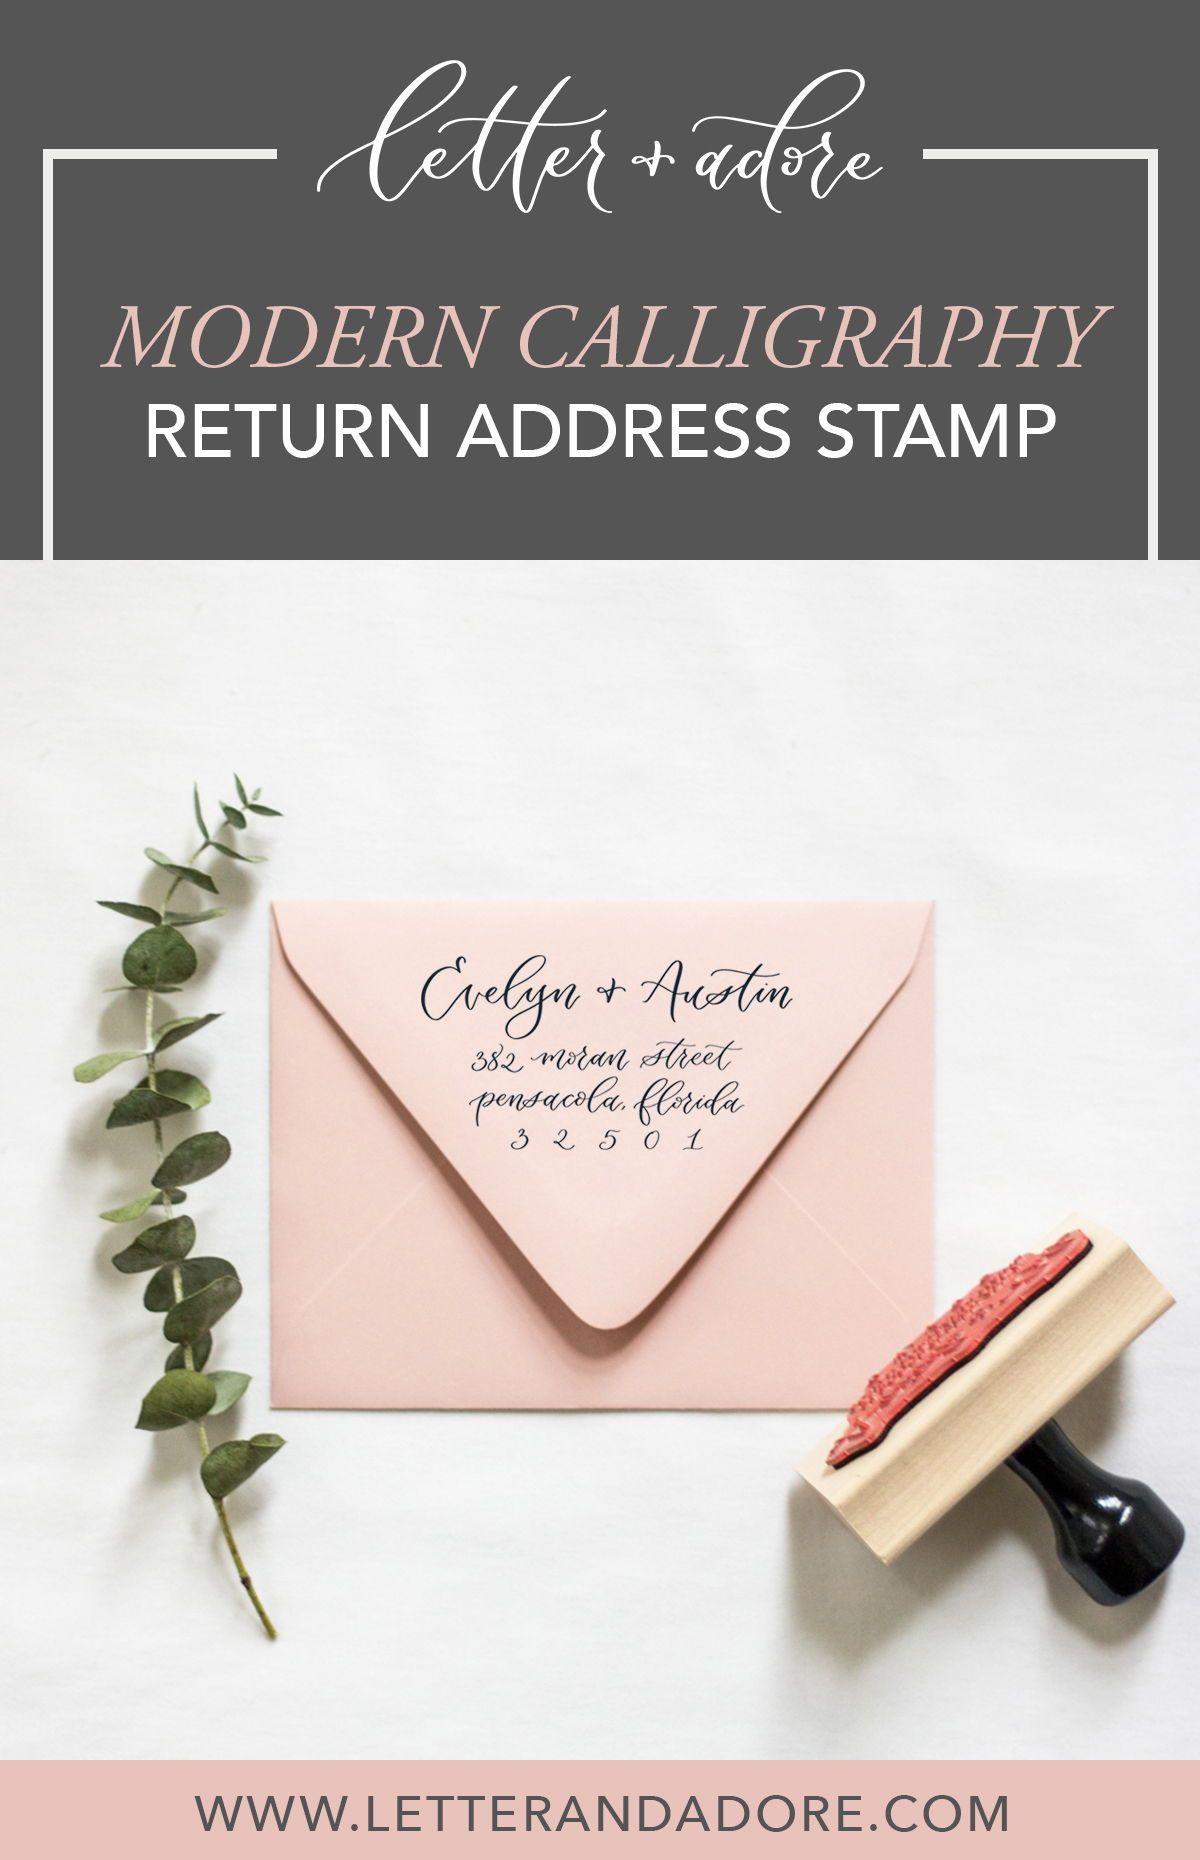 Modern Calligraphy Return Address Stamp Return address